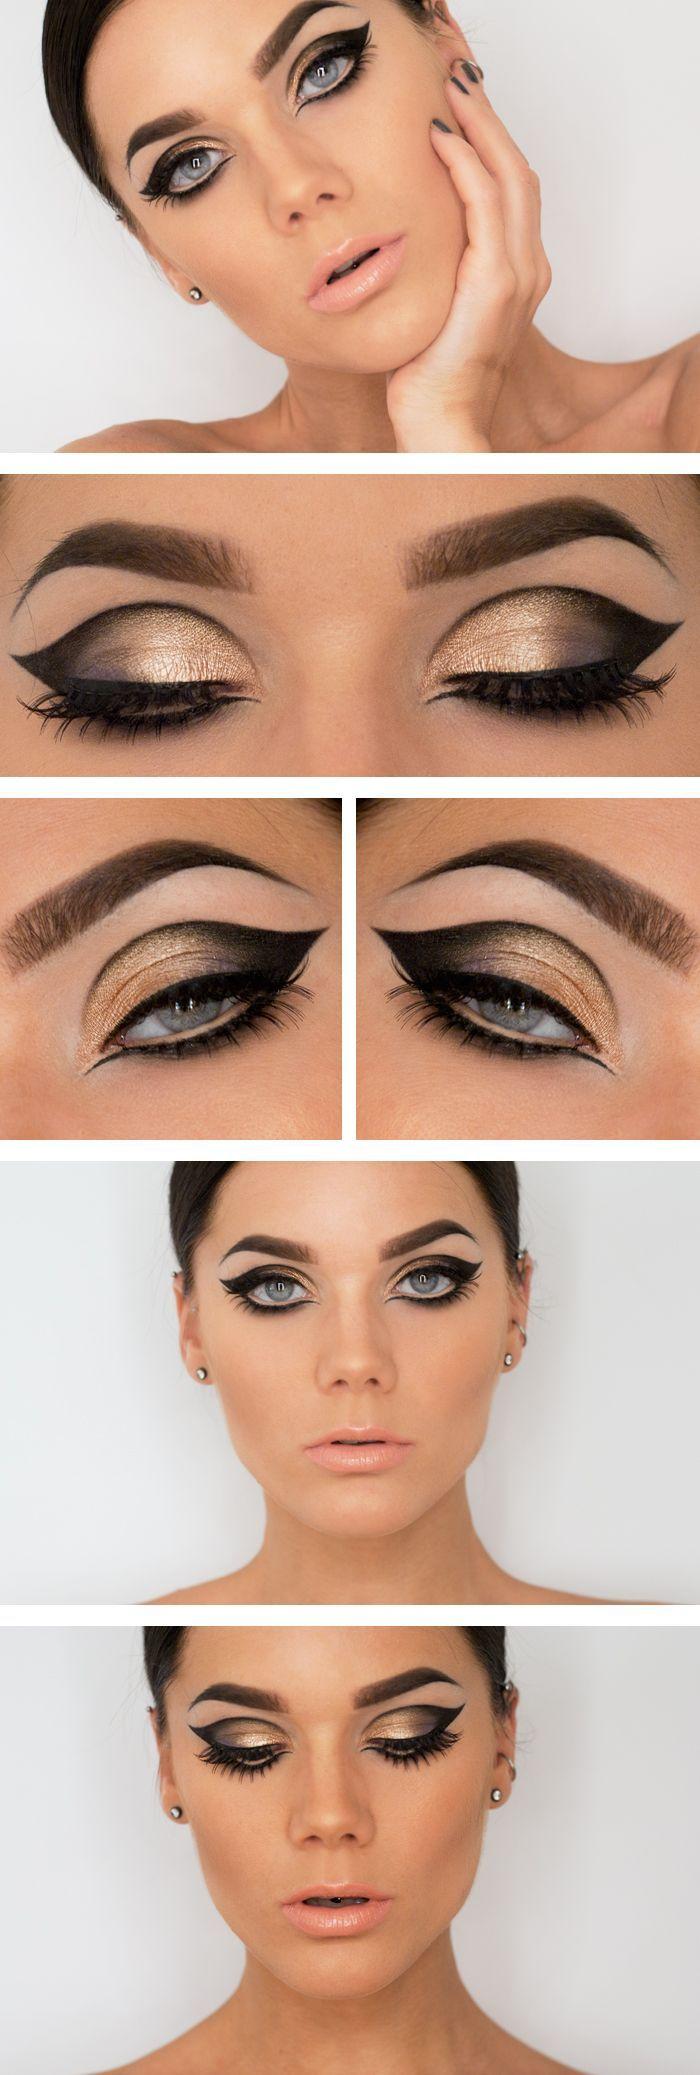 fantastic makeup.. Heather Robertson HERE TO HELP YOU BE BEAUTIFUL!!!!!!!!!!!! Natural ?? Fabulous